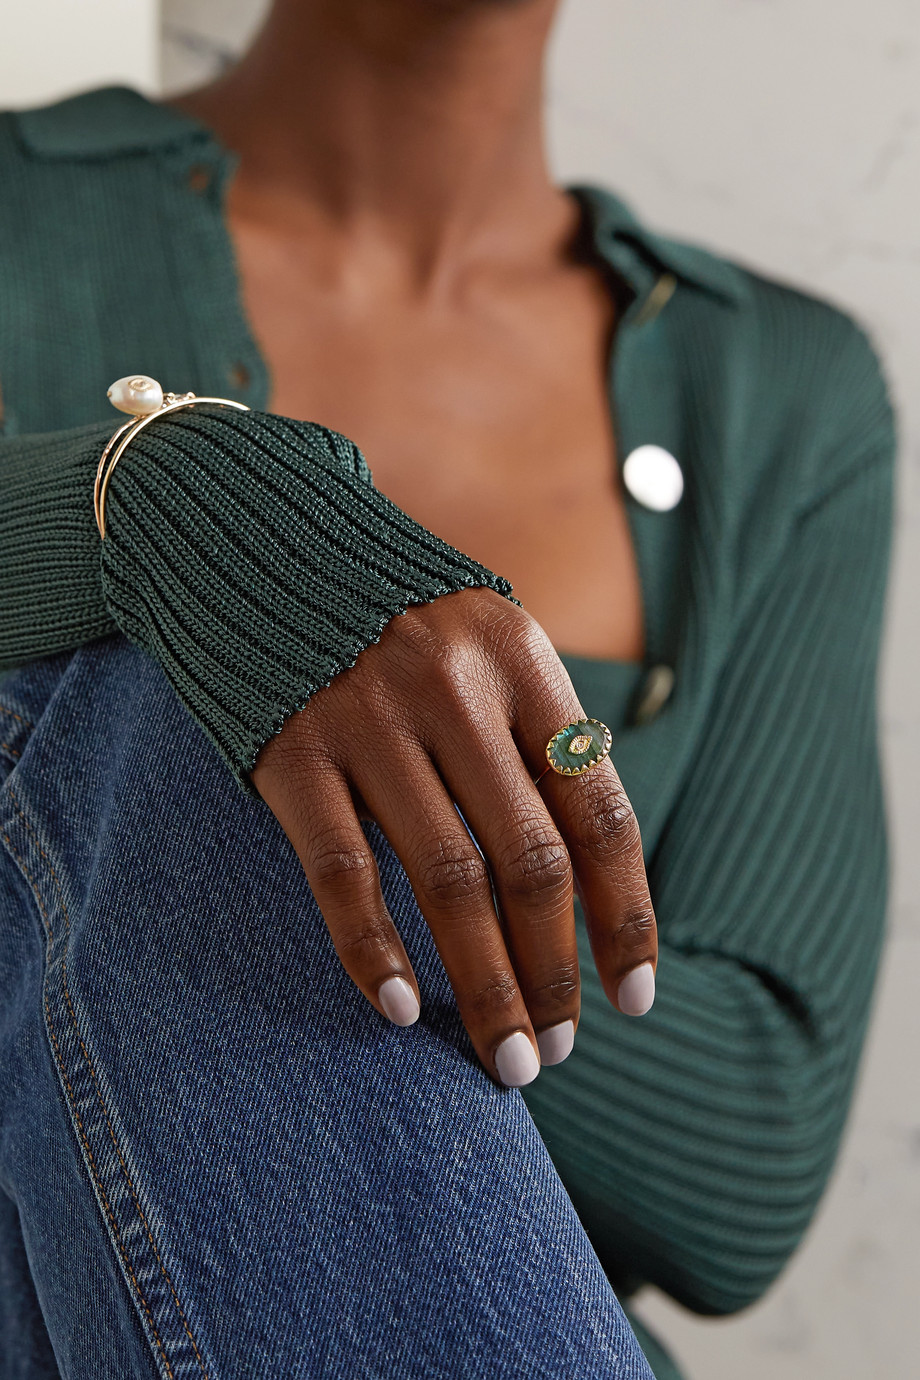 Pascale Monvoisin Souad 9-karat gold, labradorite and diamond ring